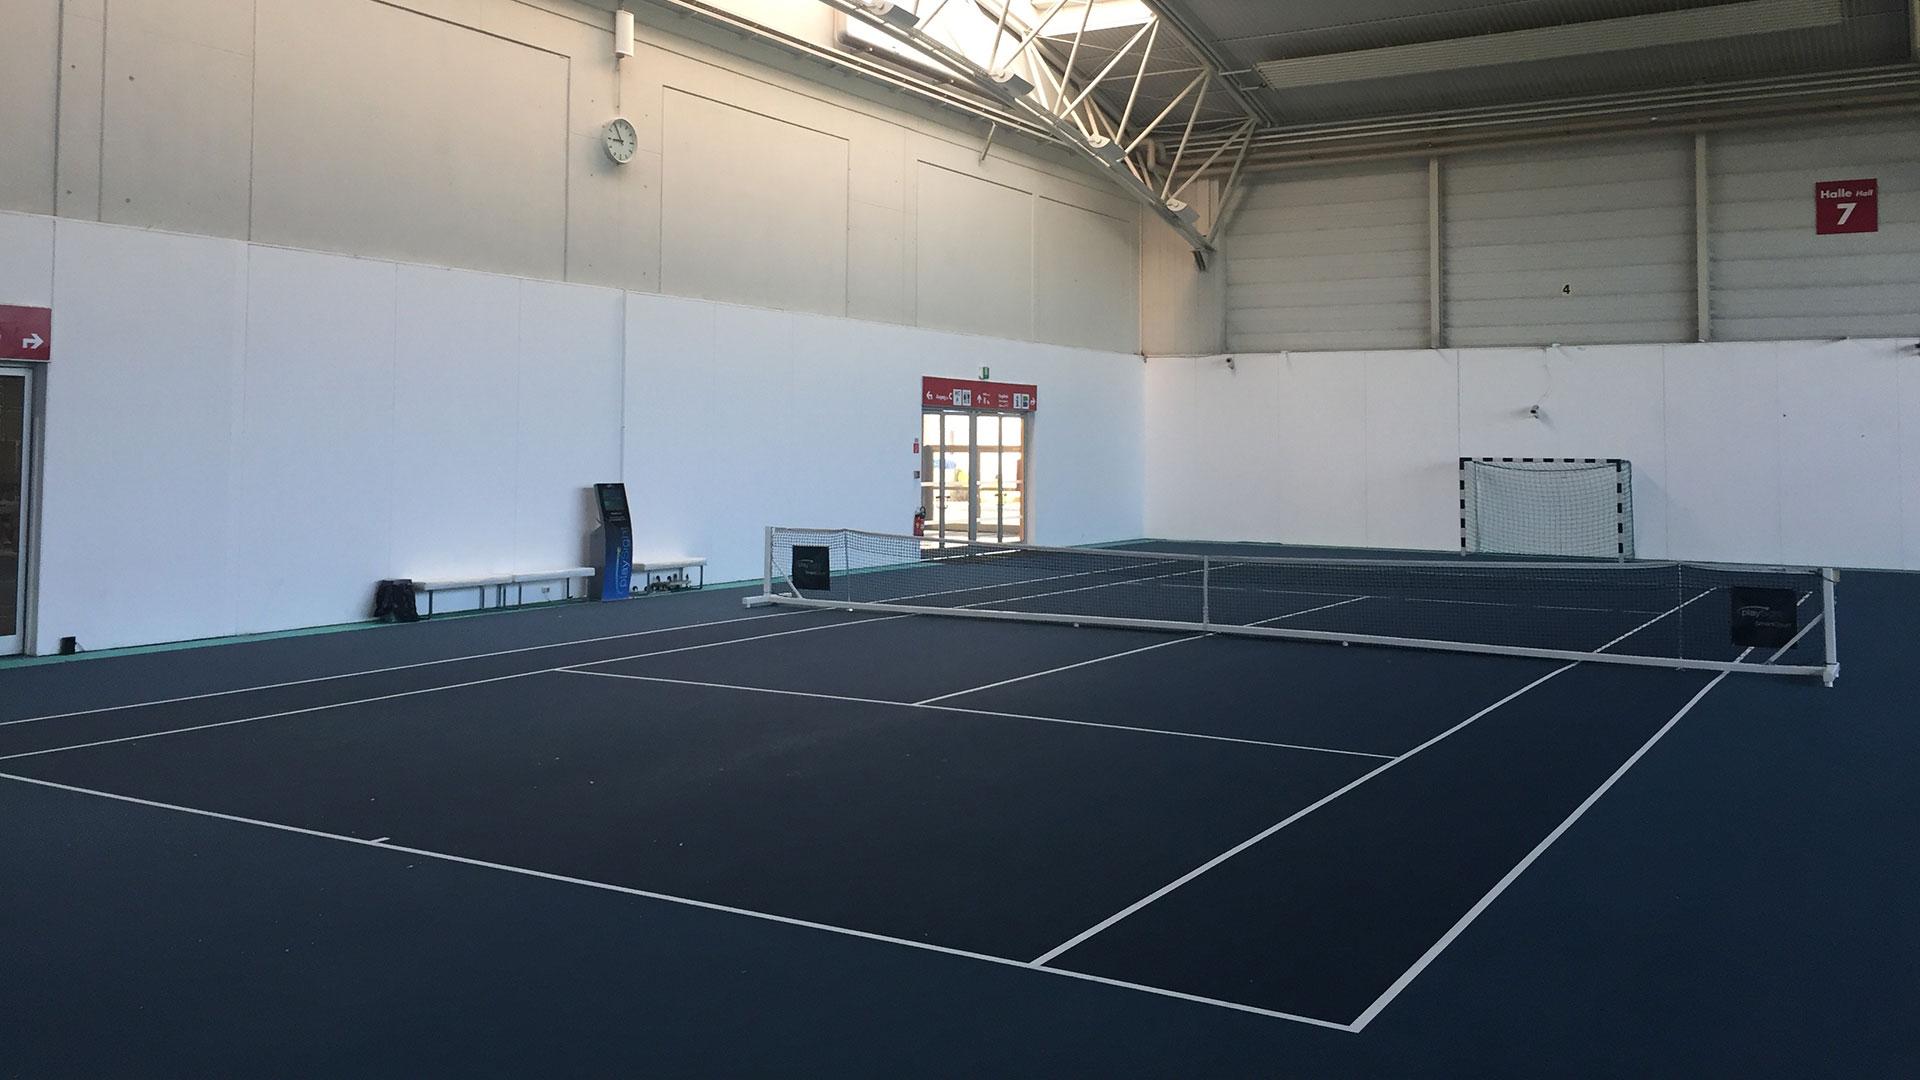 Vorarlberg Tennisverband